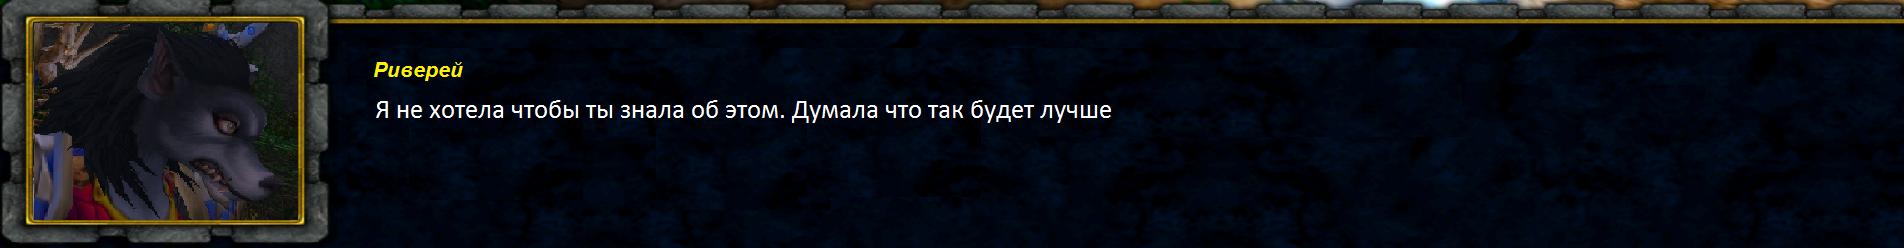 Диалоговое окно Хант шаблон 9 эпизод 03